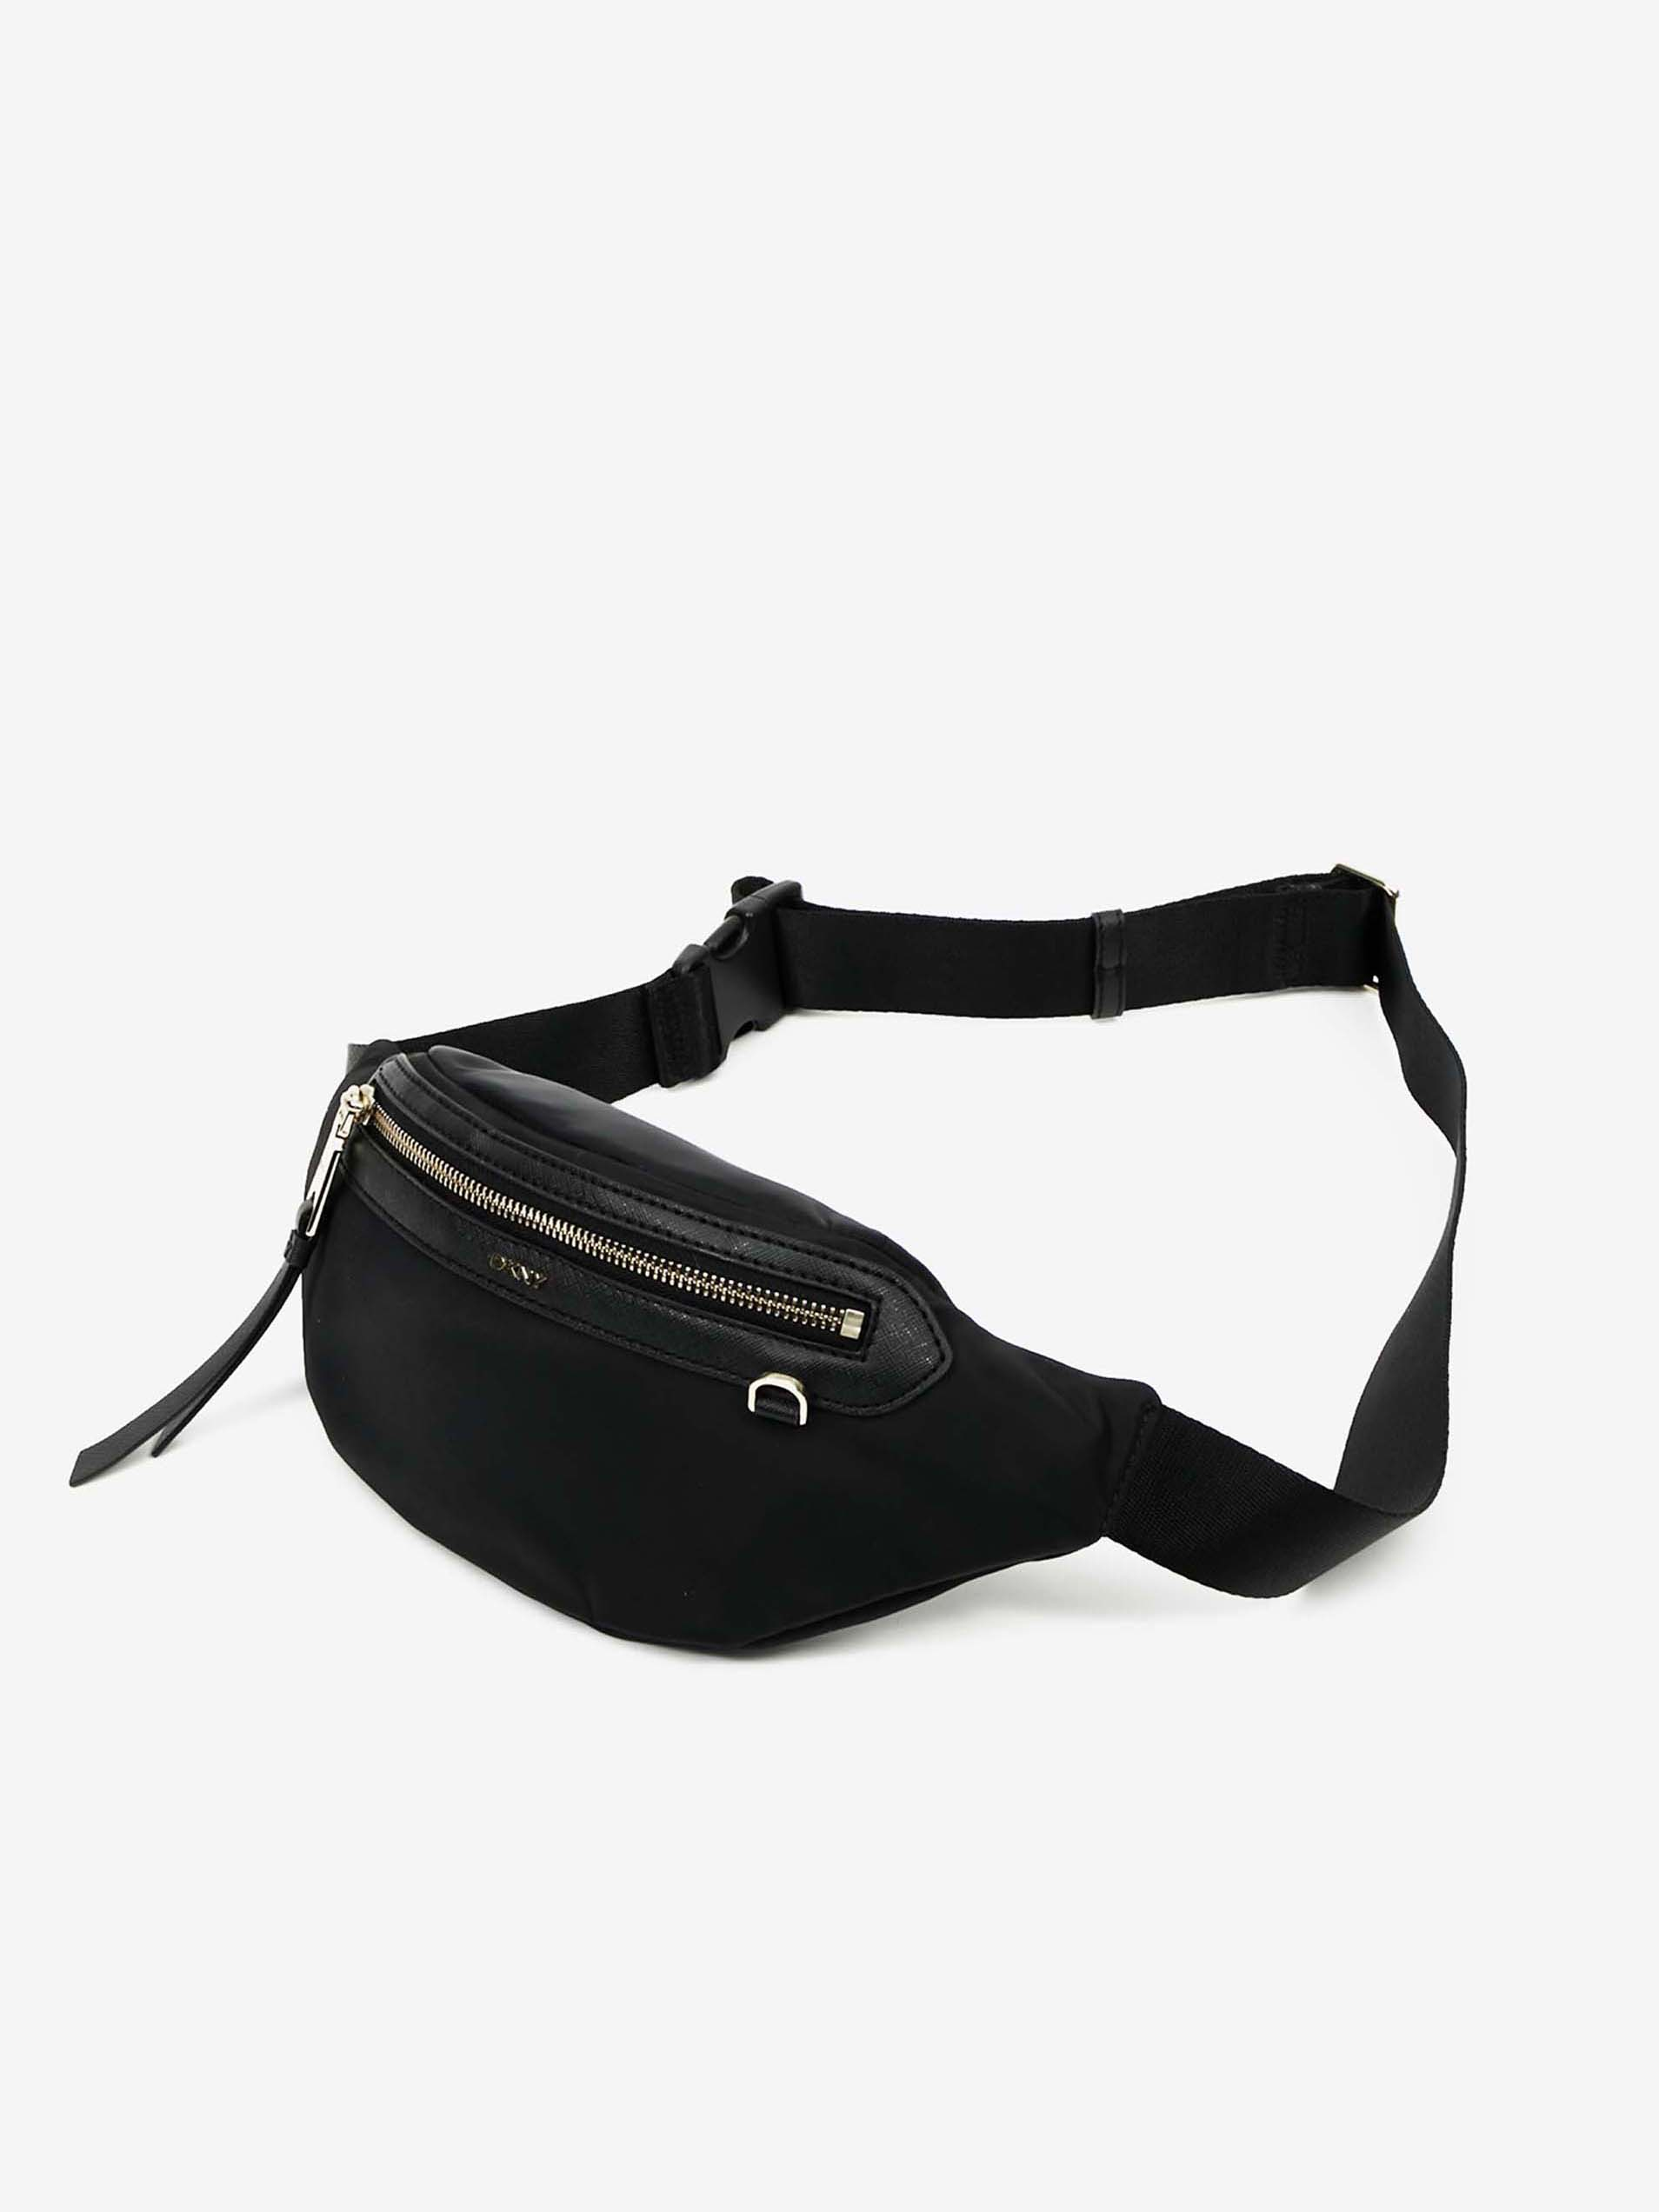 DKNY Damska torebka biodrowa czarny  BAG